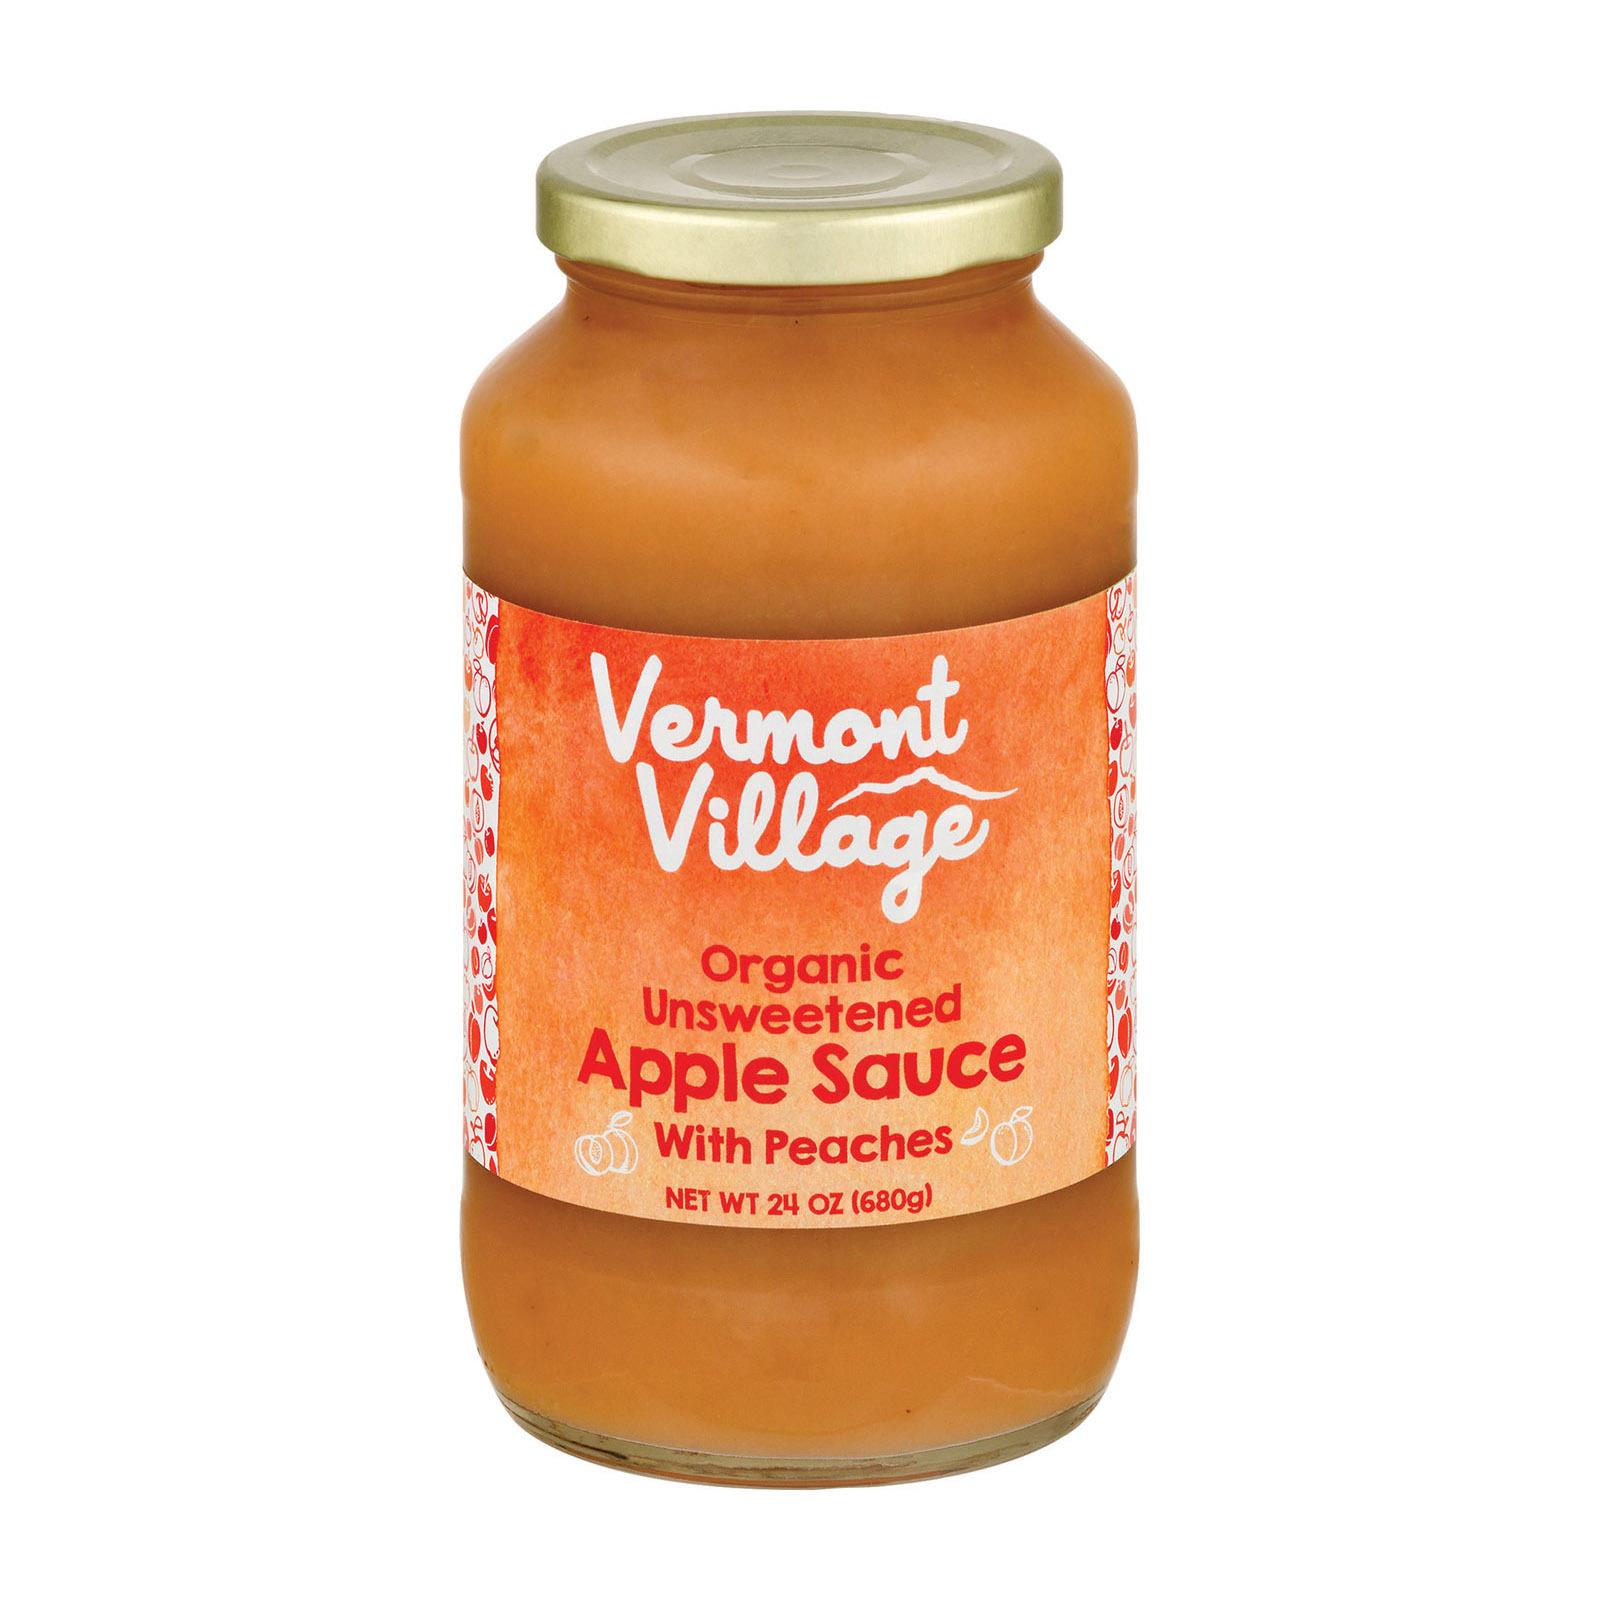 Vermont Village Organic Applesauce - Peach - Case of 6 - 24 oz.